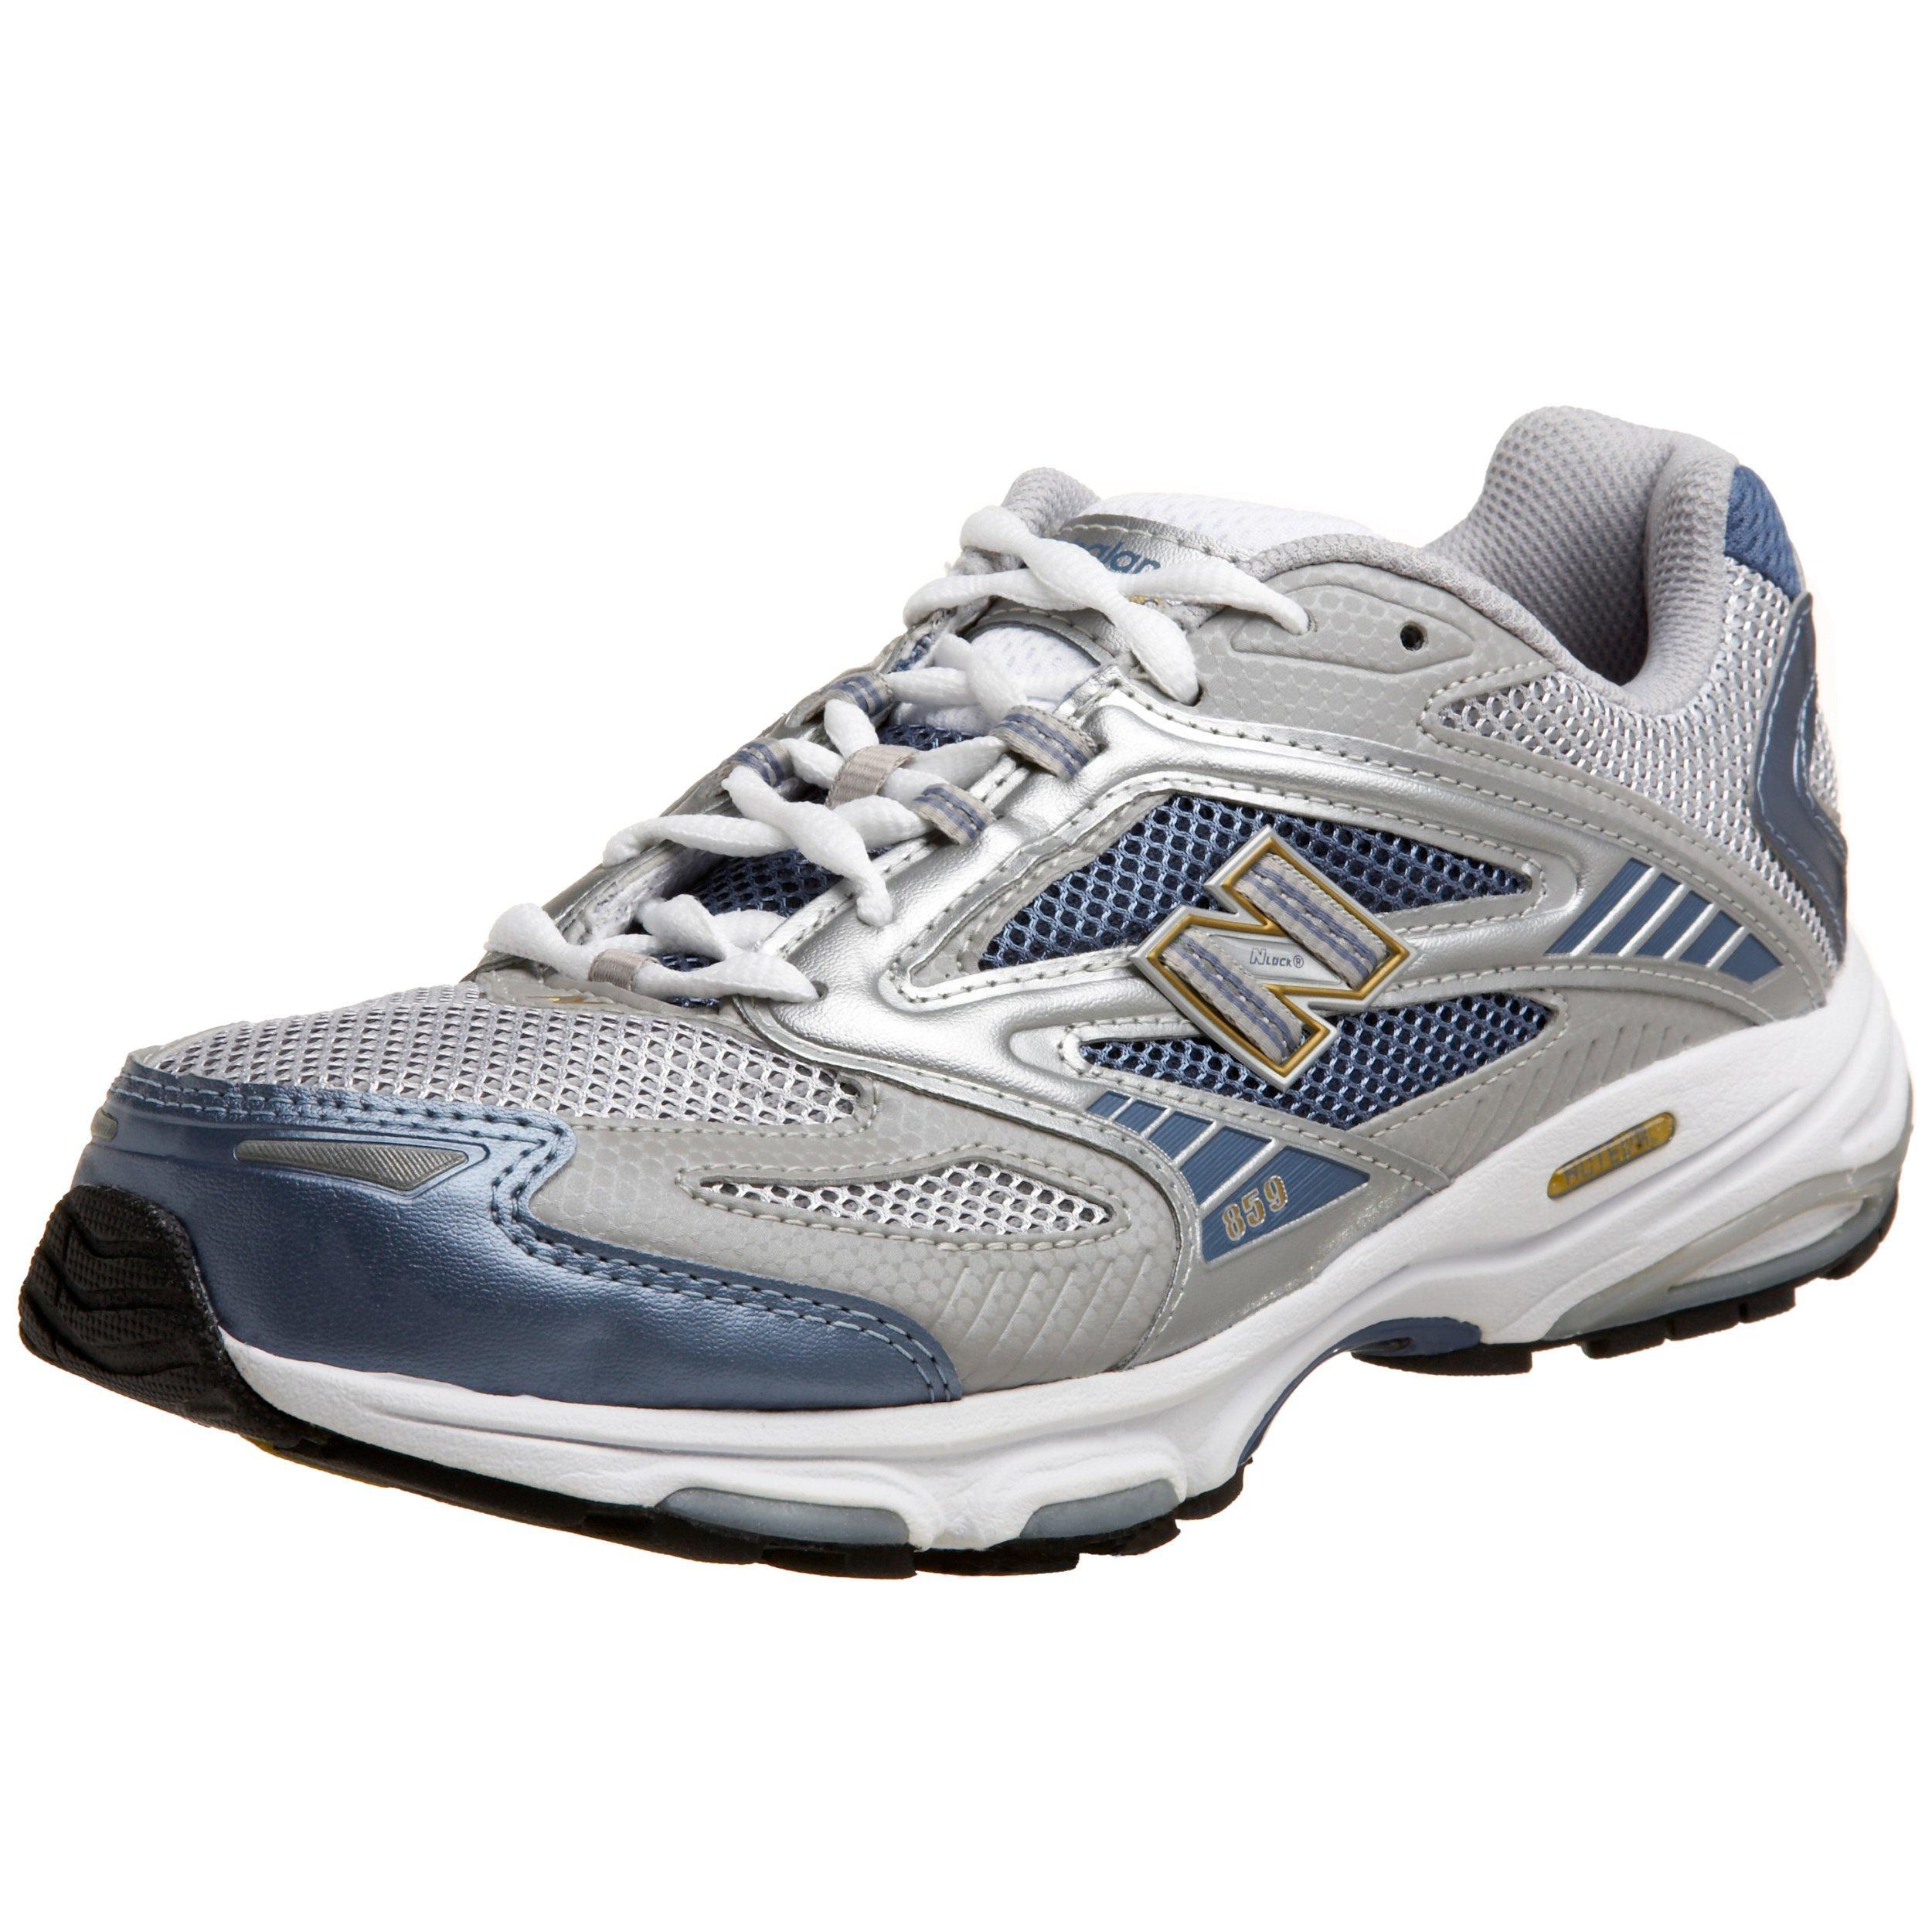 New Balance Women's WR859 Running Shoe,Grey/Powder Blue,10 B